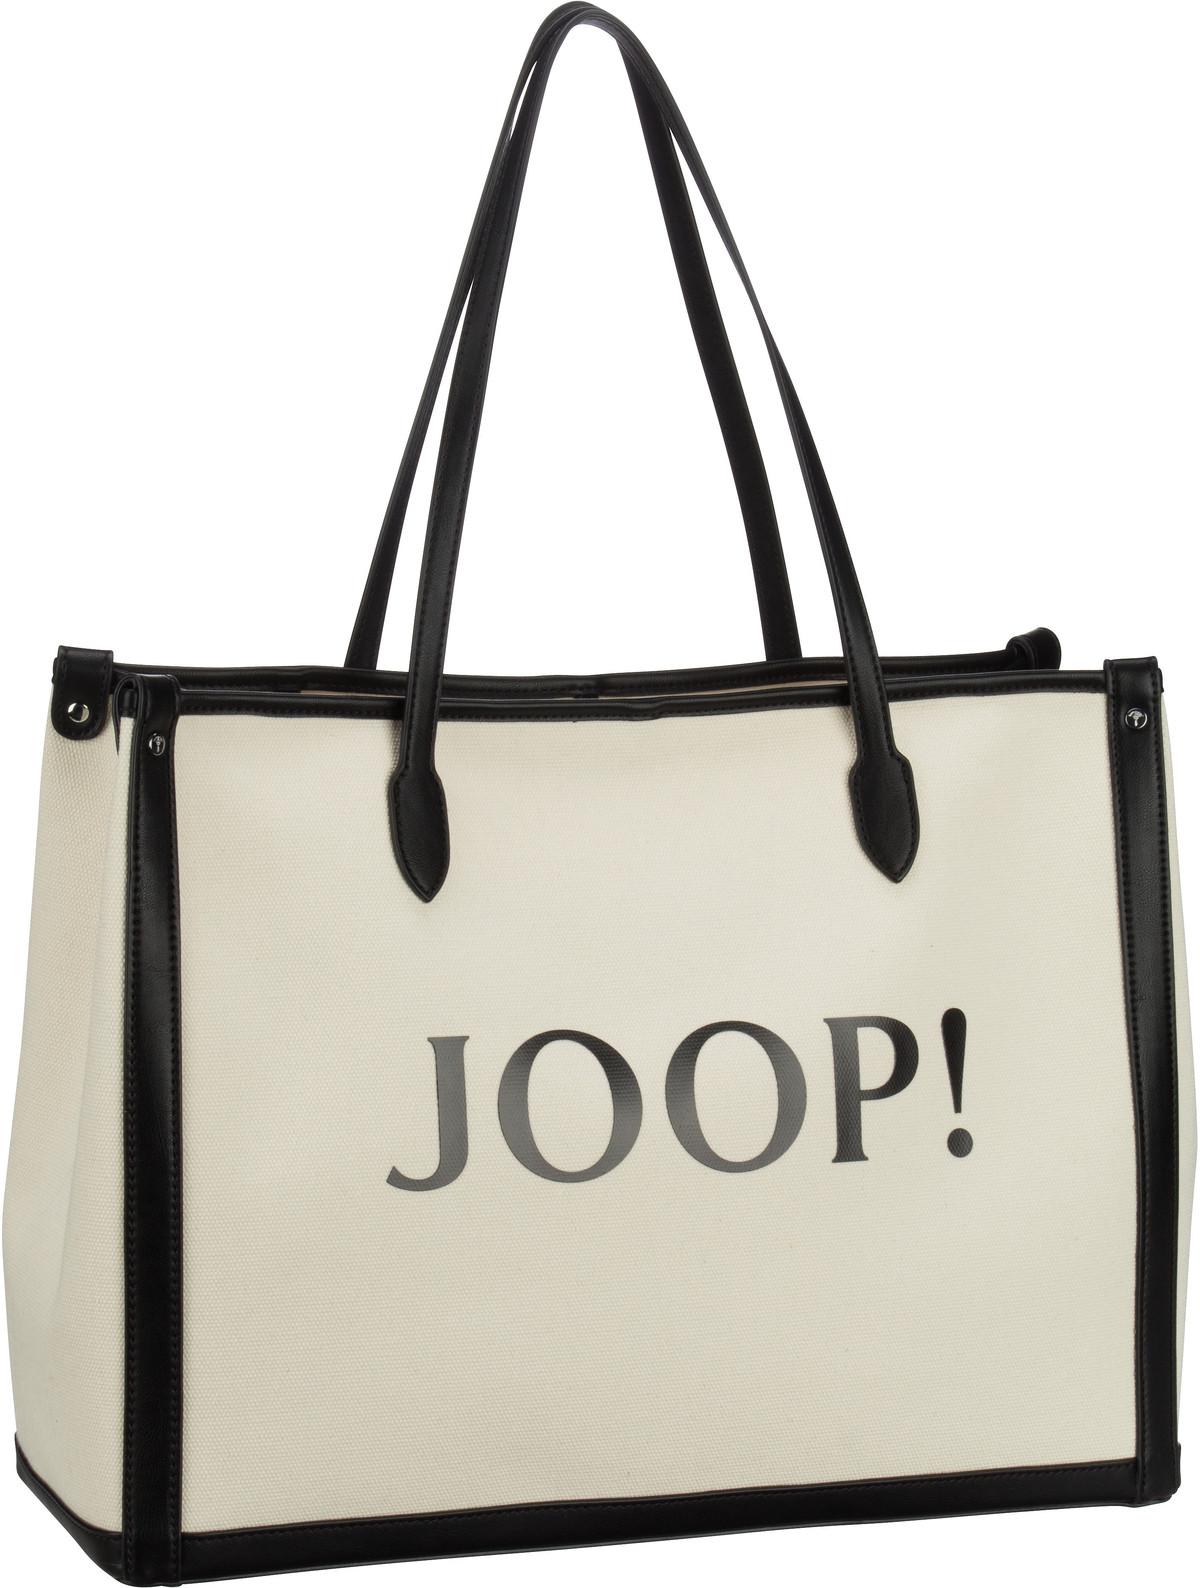 Handtasche Cotone Lelia Shopper XLHO Black